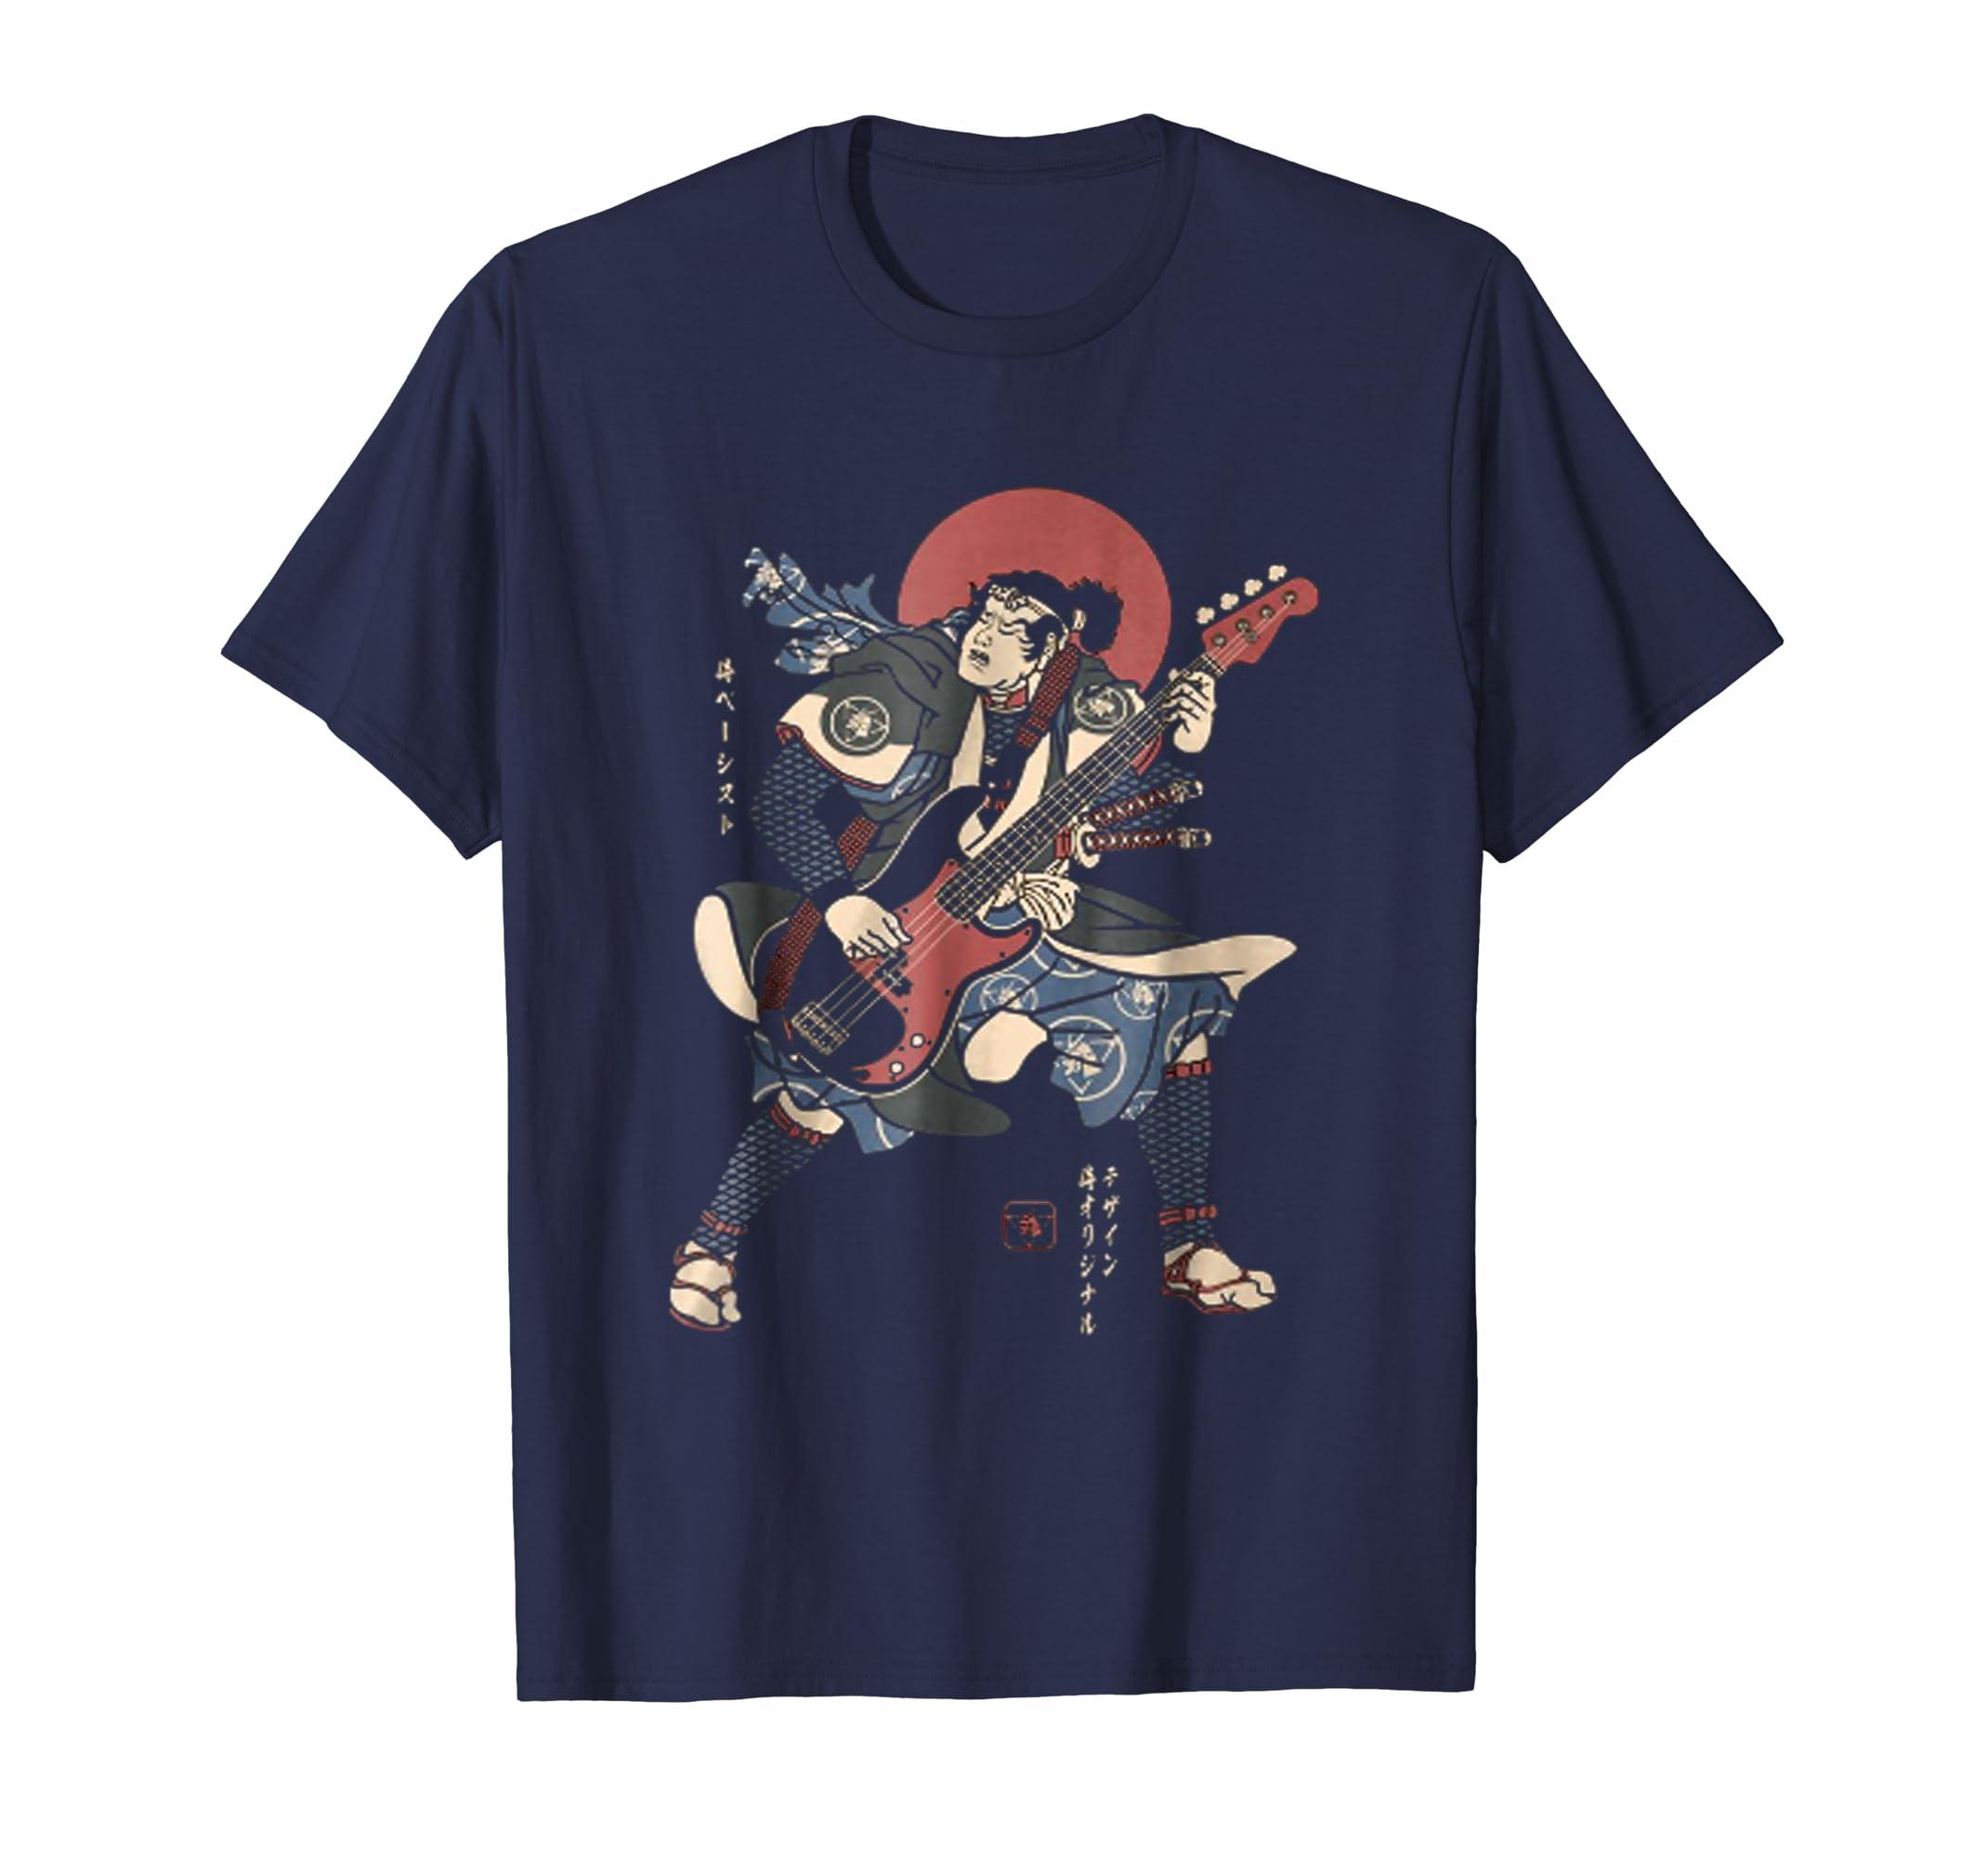 BASSIST SAMURAI NO,4, Samurai Guitar T Shirt-azvn